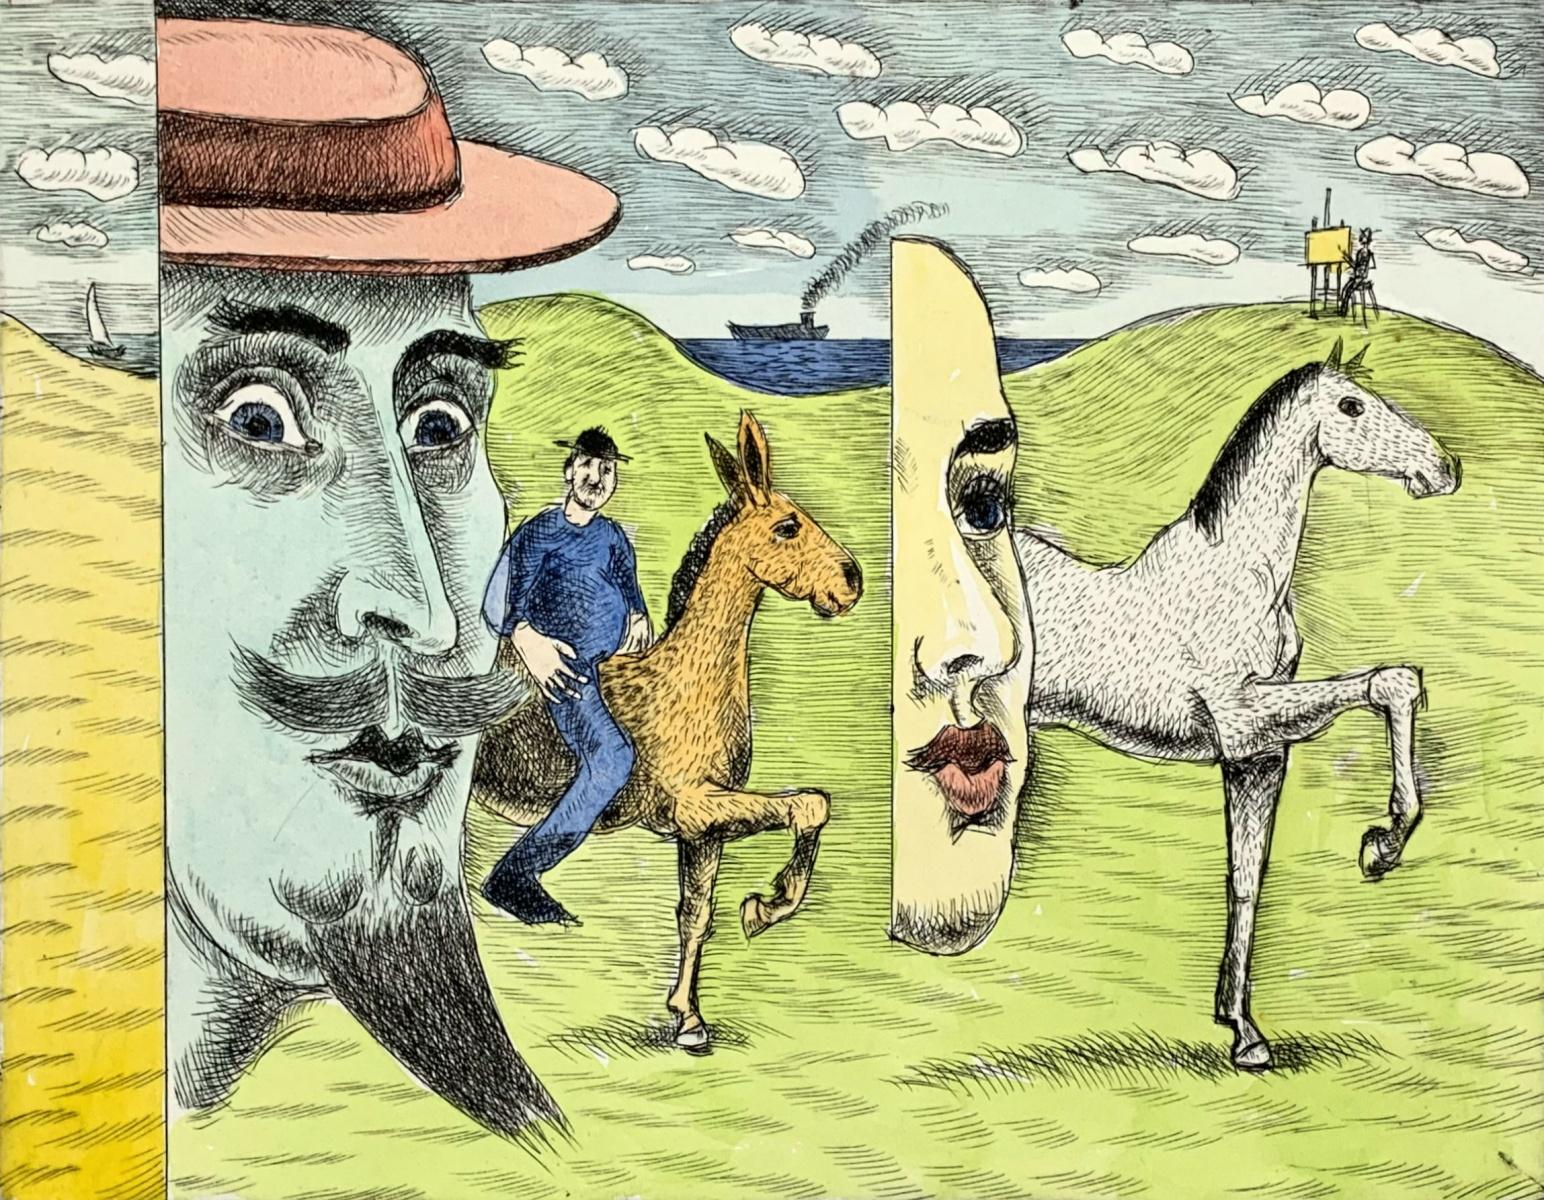 A painter & Don Kichot - XXI Century, Figurative drypoint print & watercolor